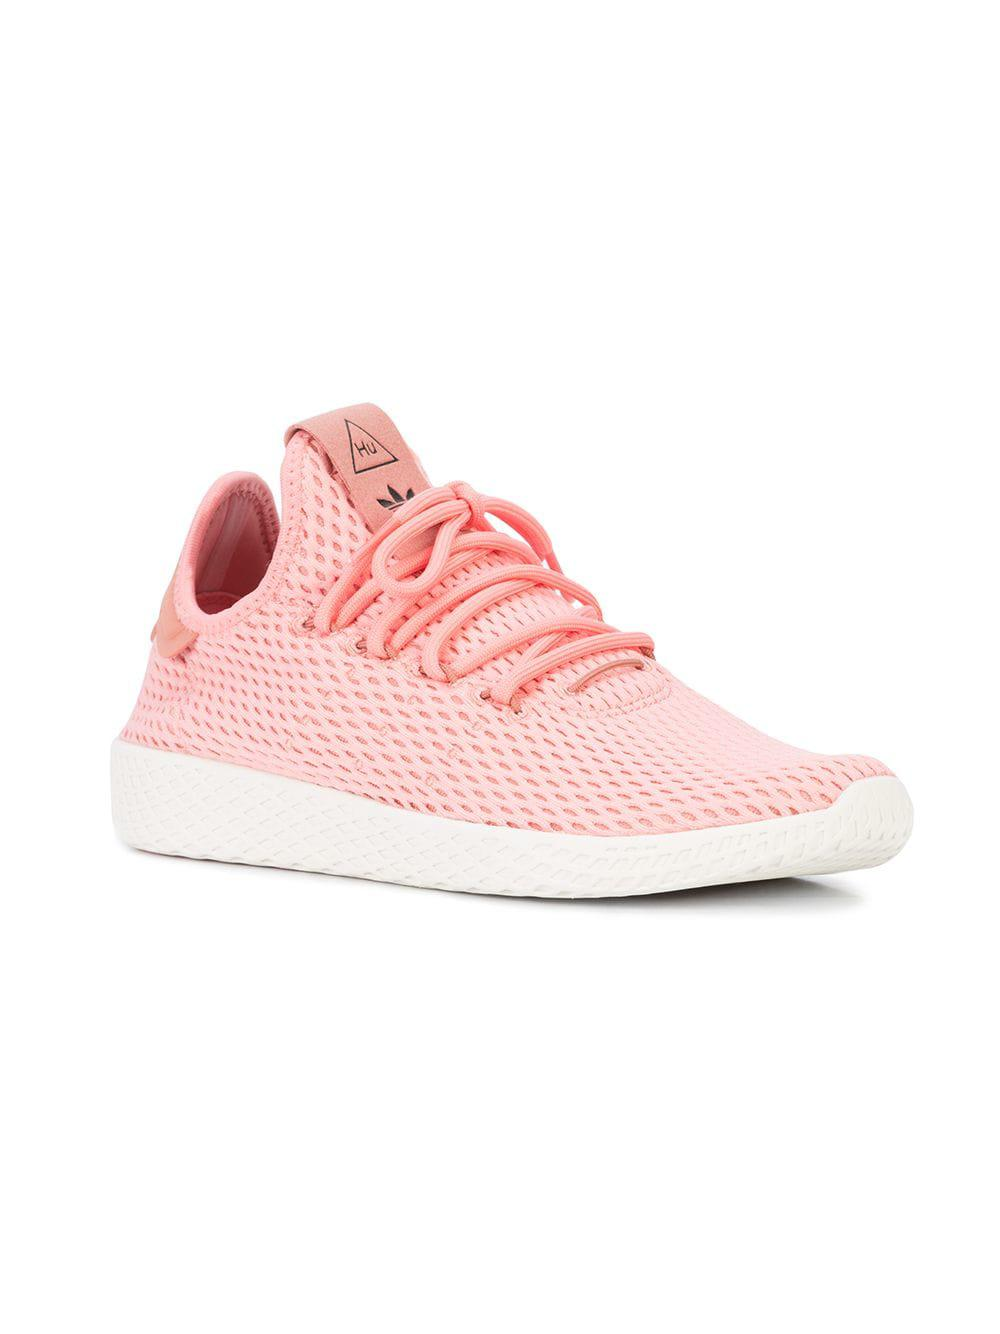 dd568d3ff Adidas Originals - Pink Pharrell Williams Tennis Hu Sneakers for Men - Lyst